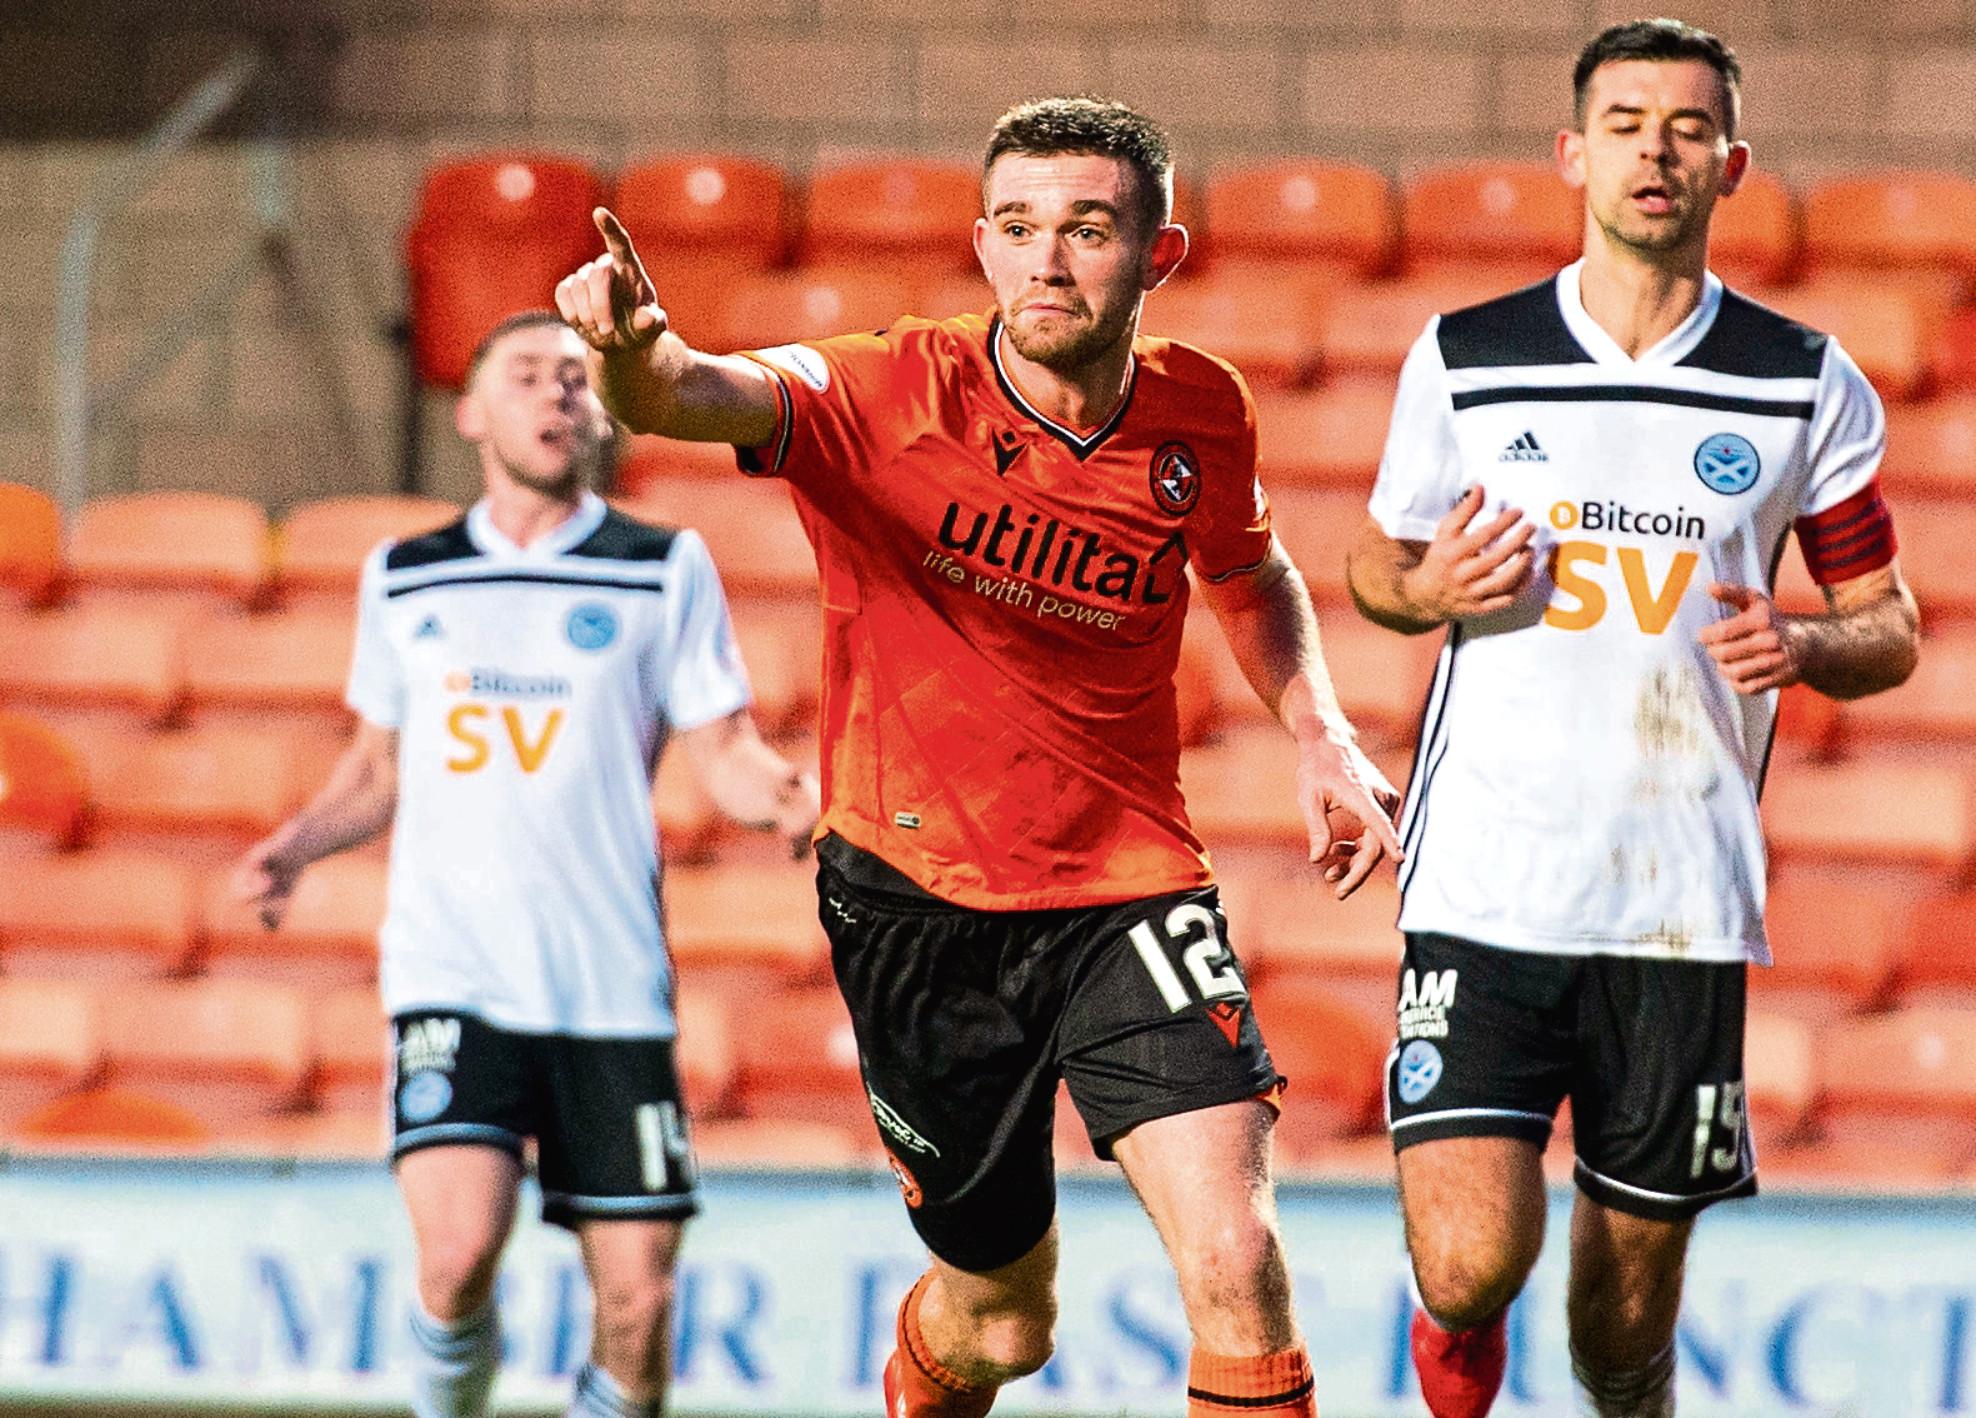 Dundee United midfield man Sam Stanton celebrates scoring against Ayr United.